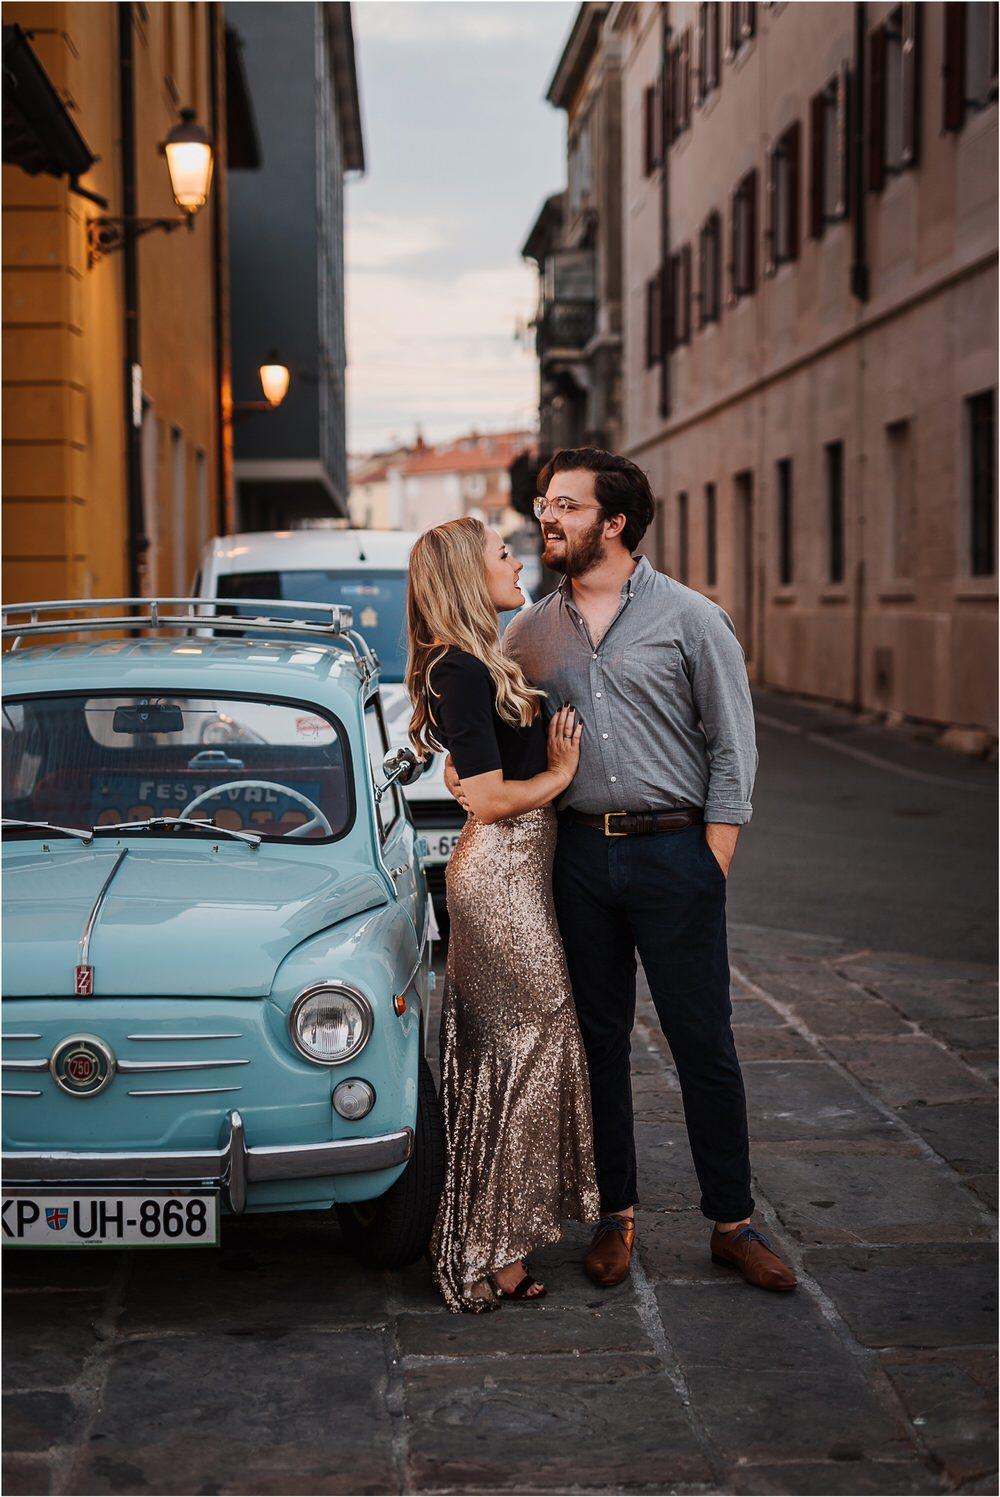 piran wedding photographer engagement anniversary honeymoon photography recommended slovenia seaside photographer  0070.jpg